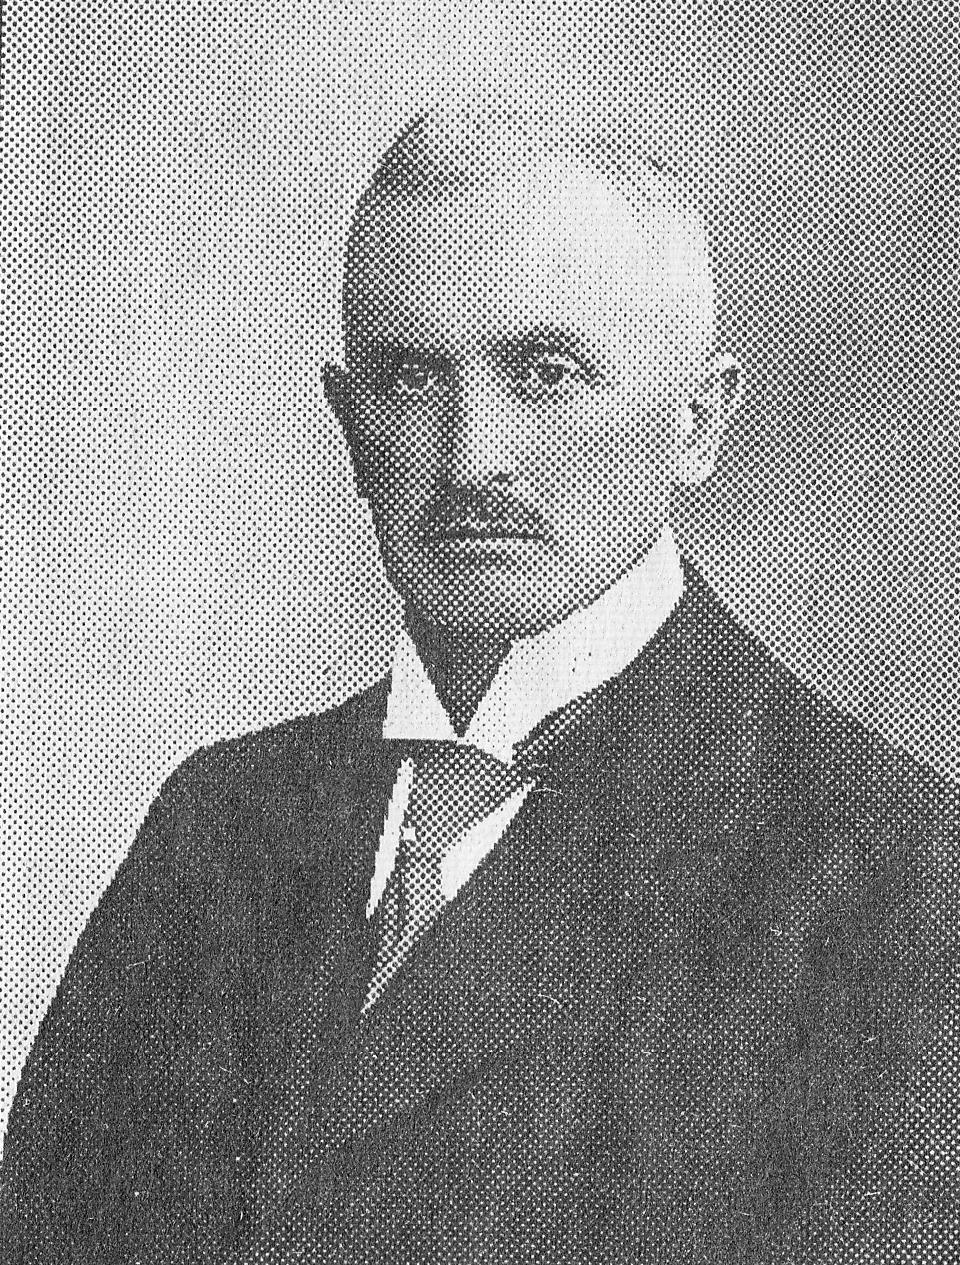 Överläkre Reinhold Hartelius